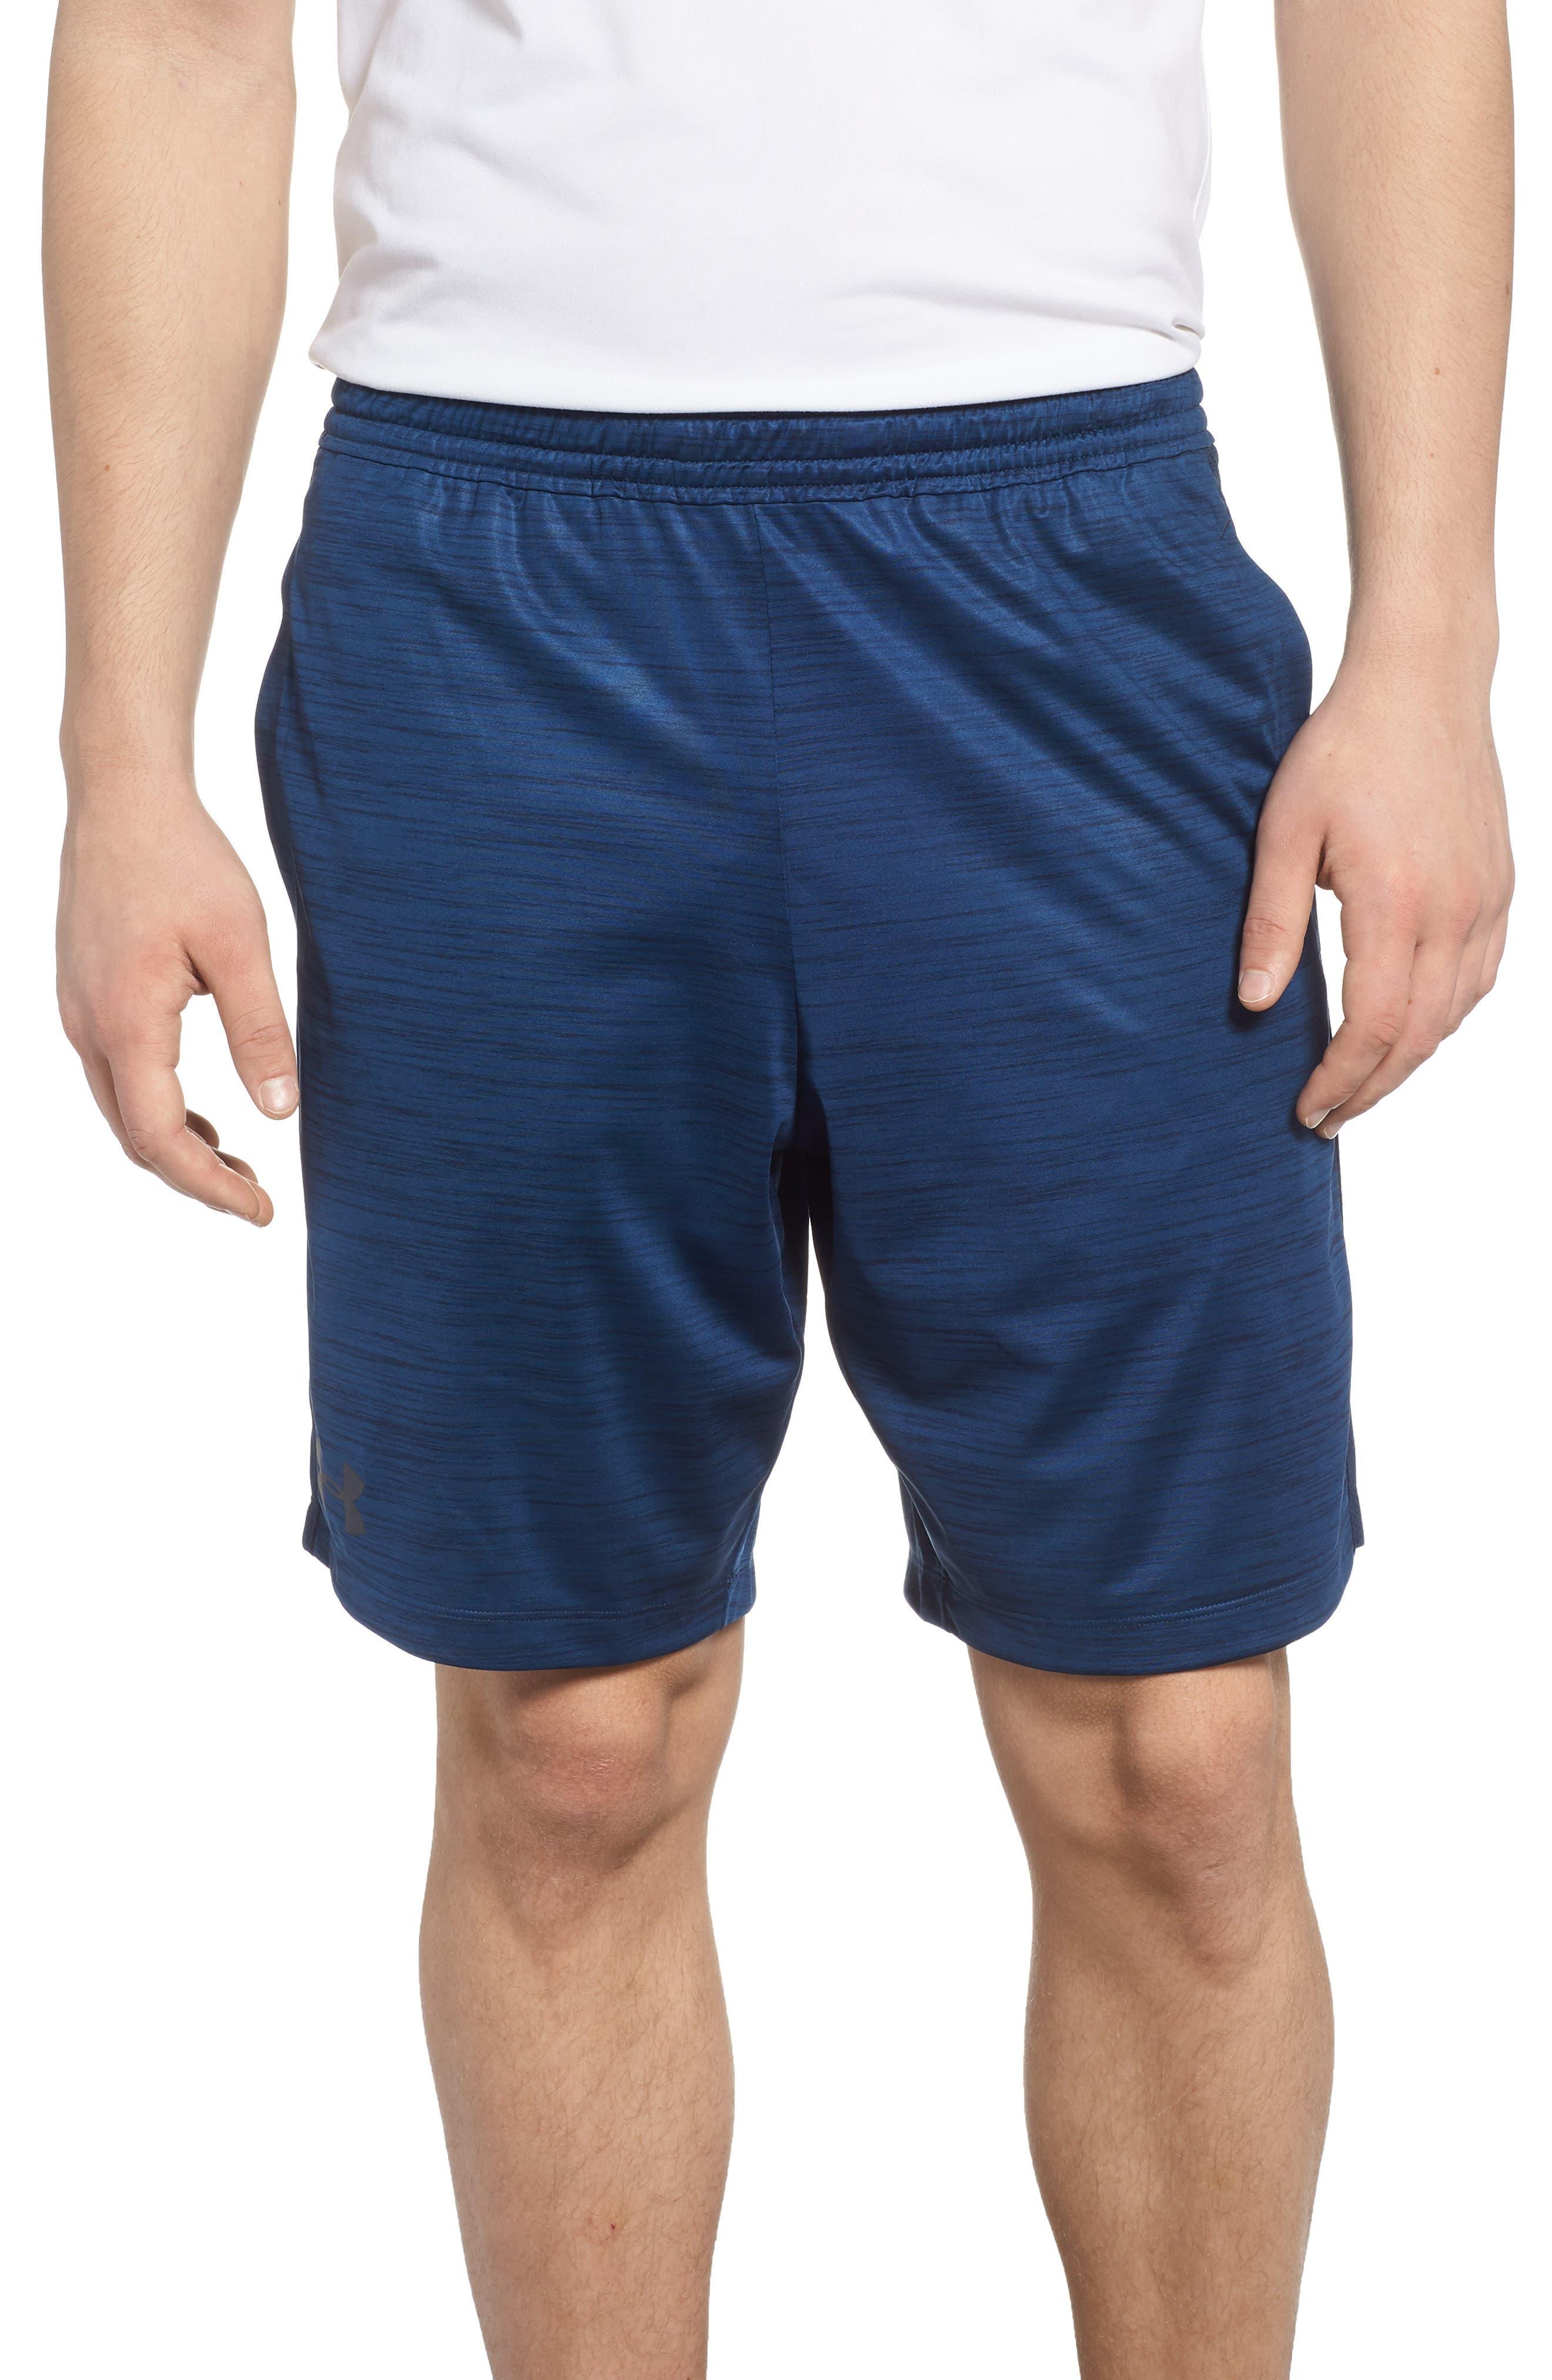 MK1 Twist Shorts,                             Main thumbnail 1, color,                             Academy/ Stealth Greh